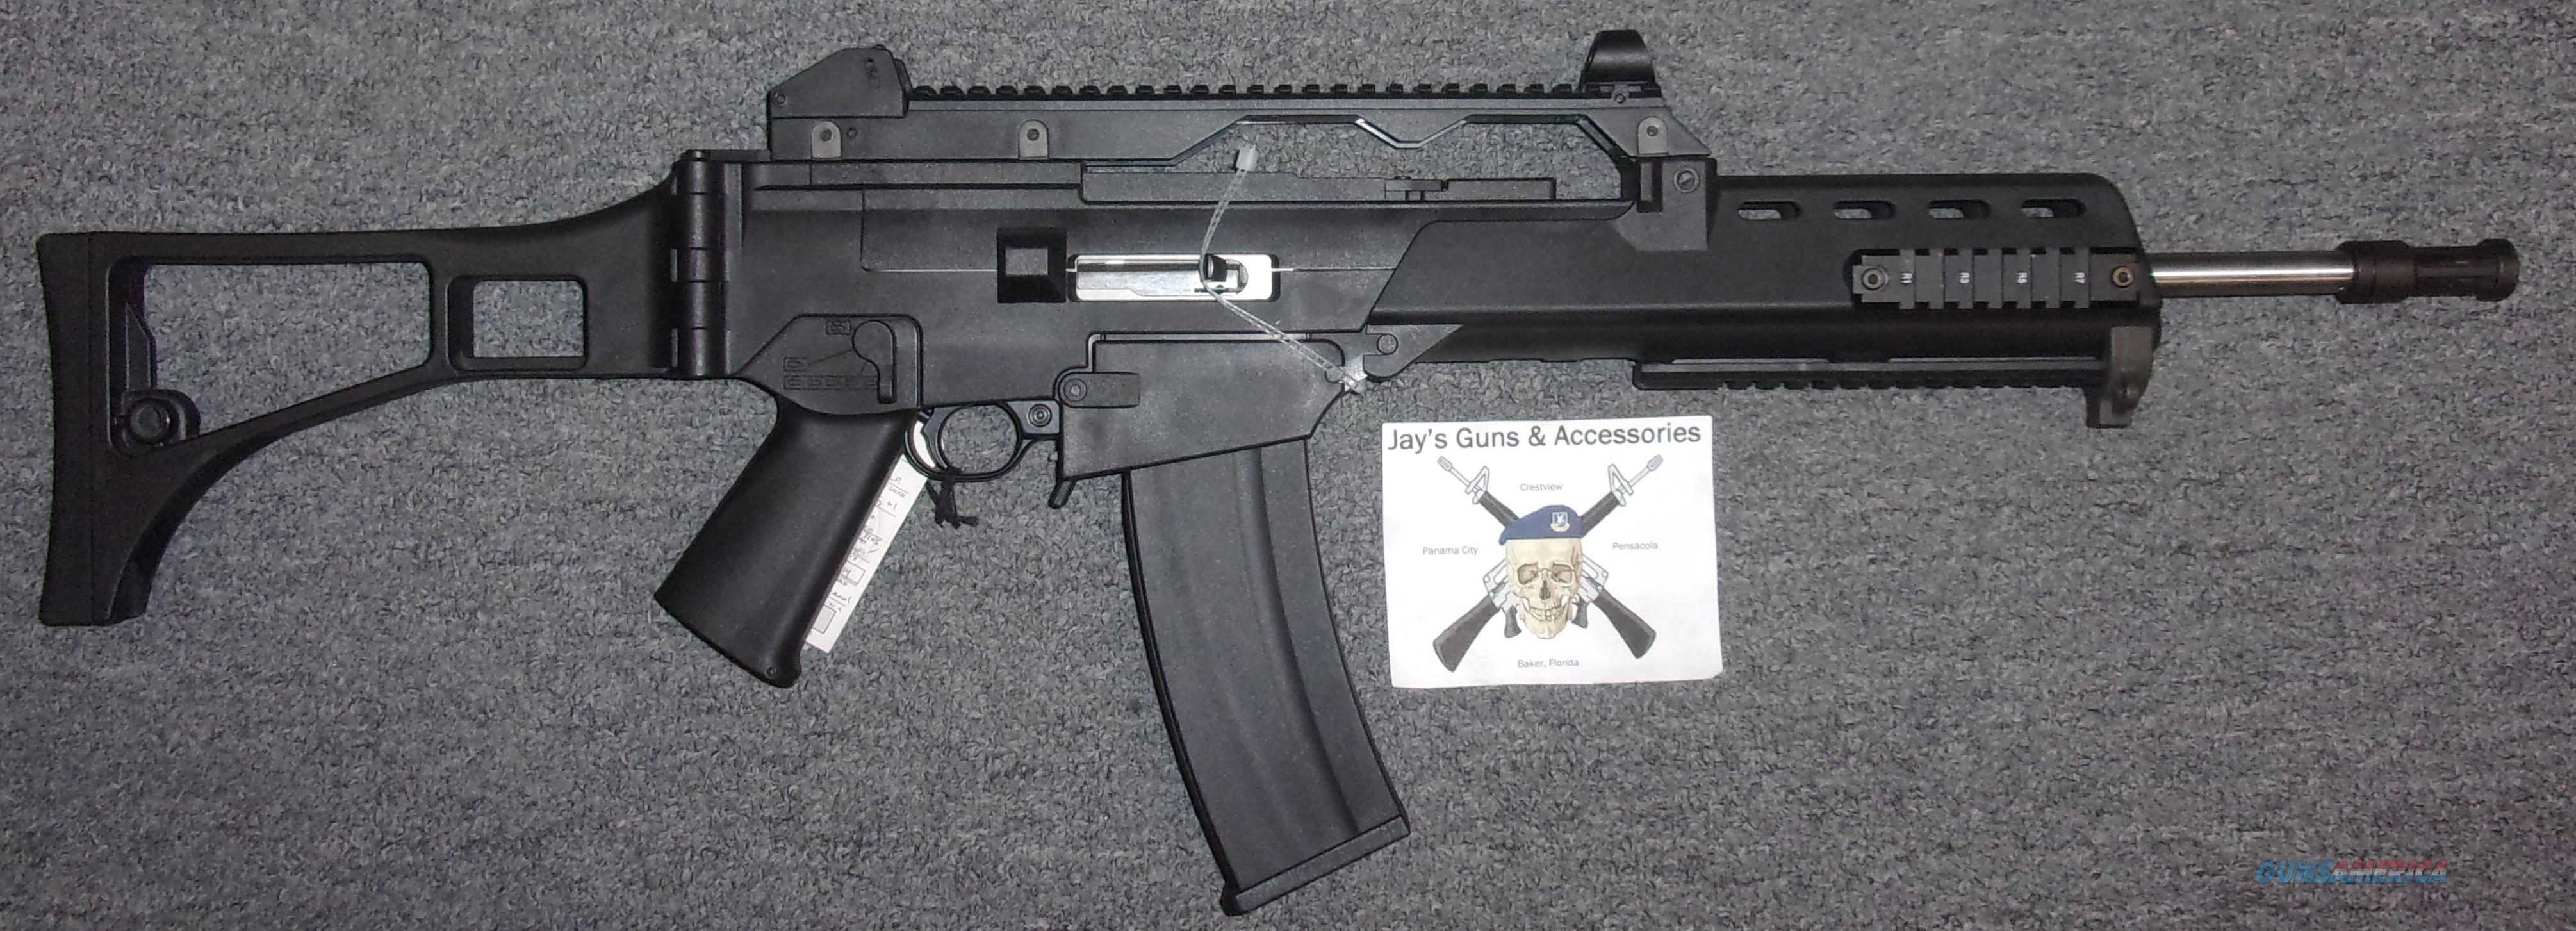 Ruger 10/22 (G36 Clone)  Guns > Rifles > Ruger Rifles > 10-22